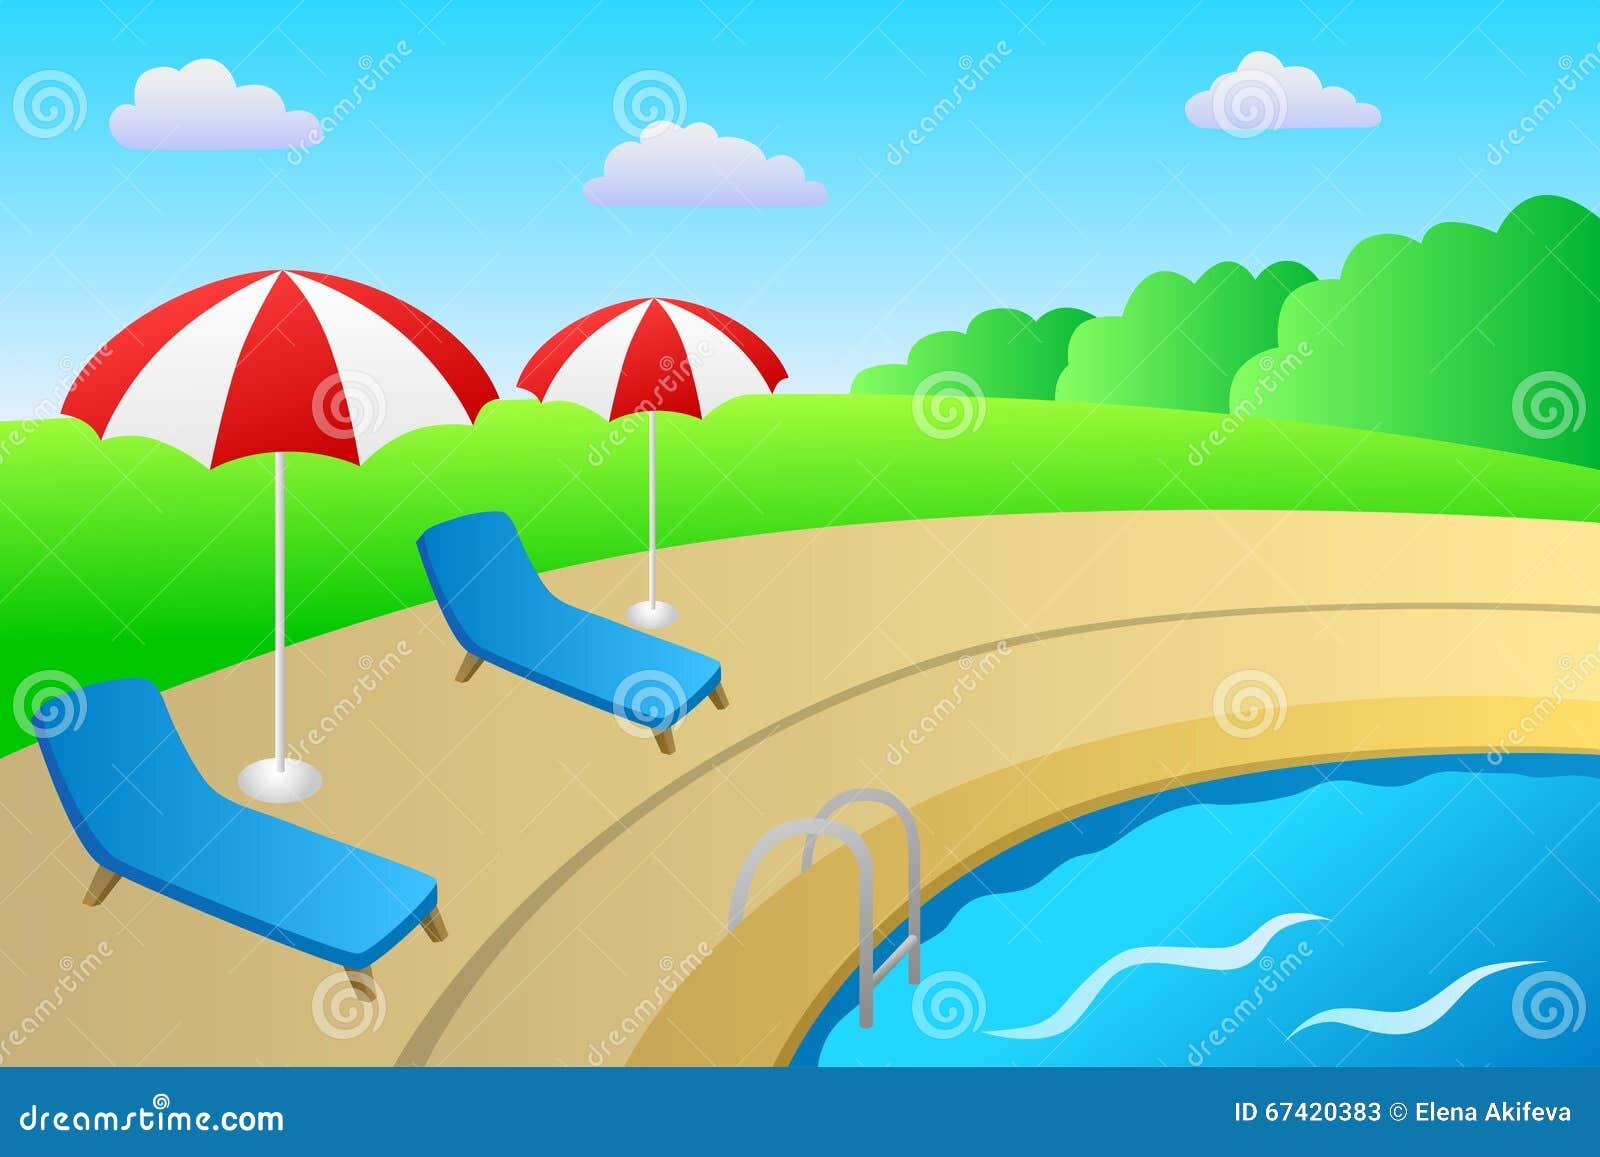 summer wallpaper swimming vector - photo #8